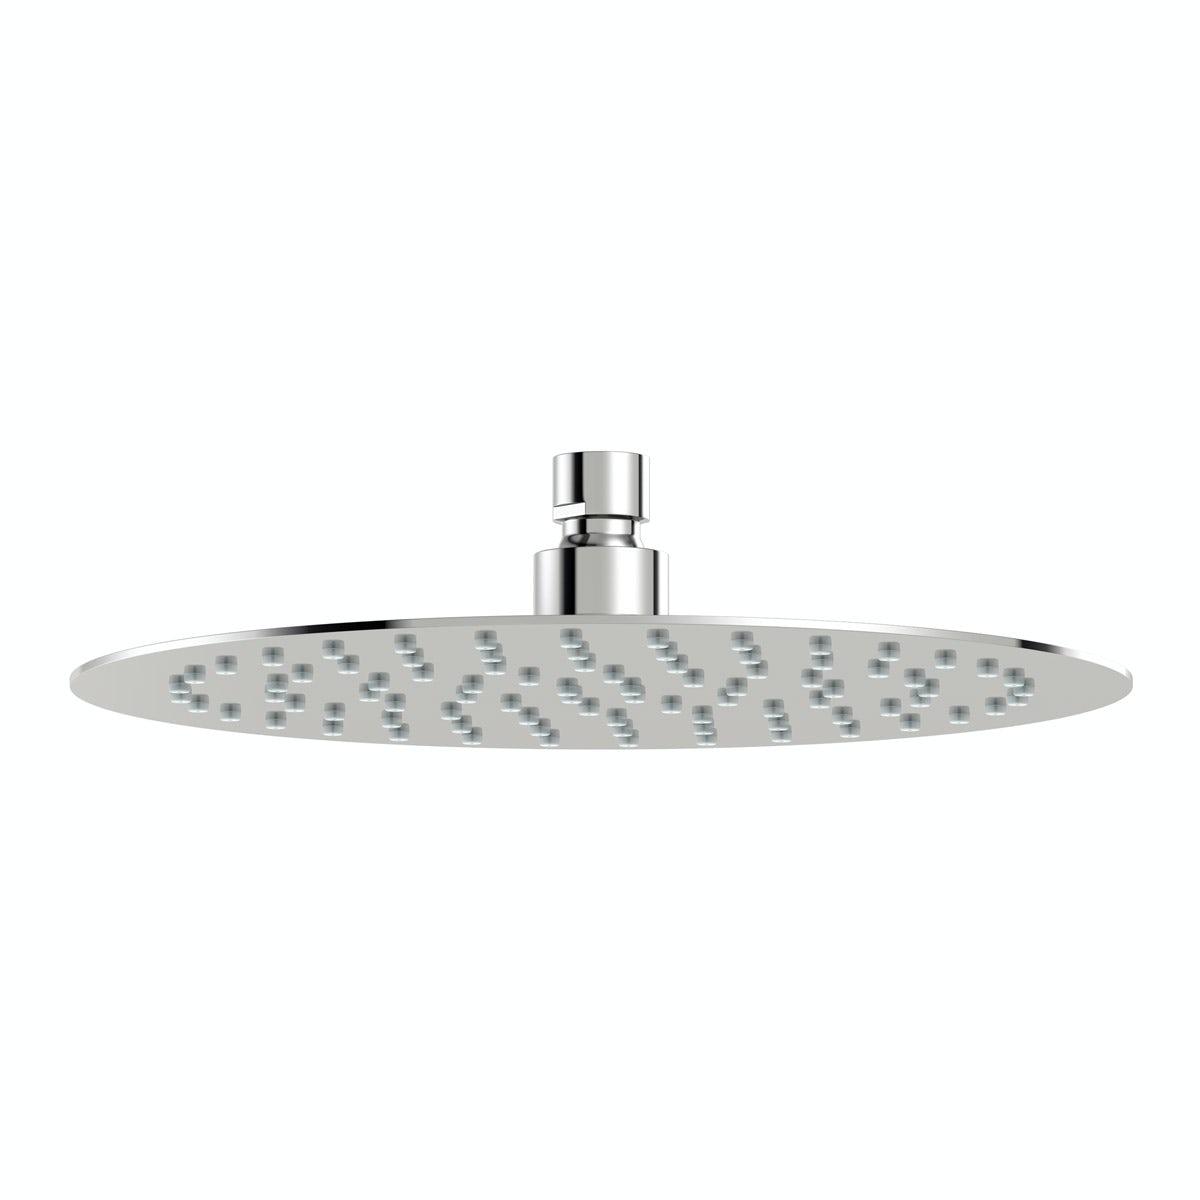 Mode Renzo round slim stainless steel shower head 250mm